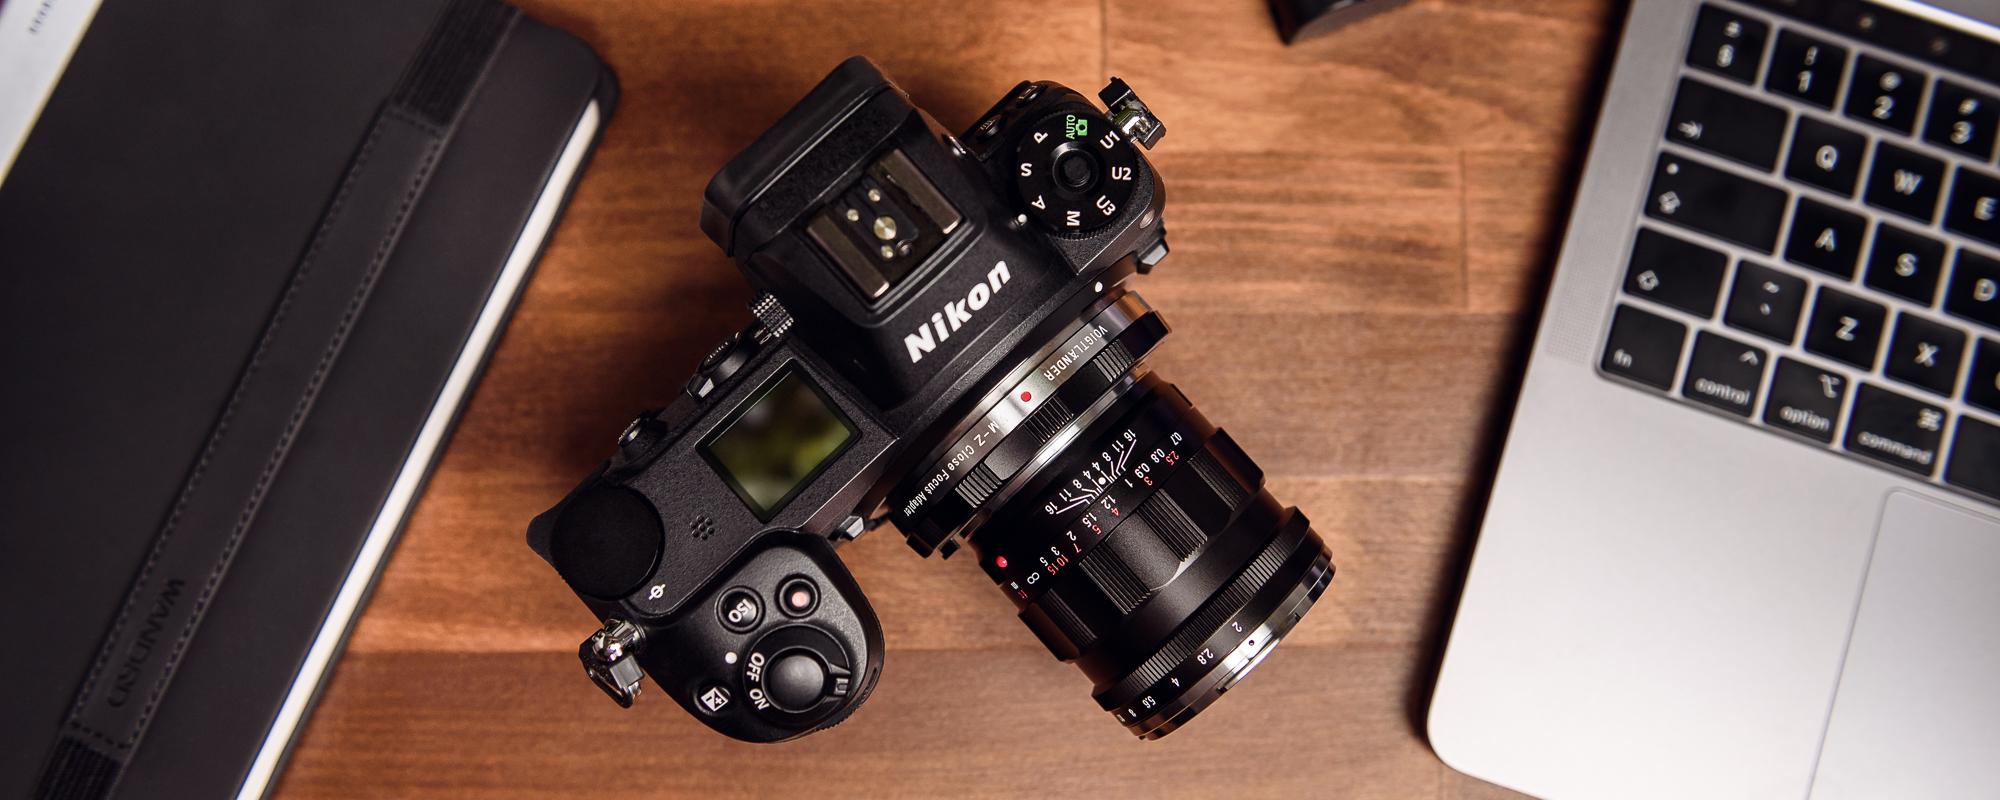 Voigtlander APO Lanthar 50mm f/2.0 lens for Leica M on camera